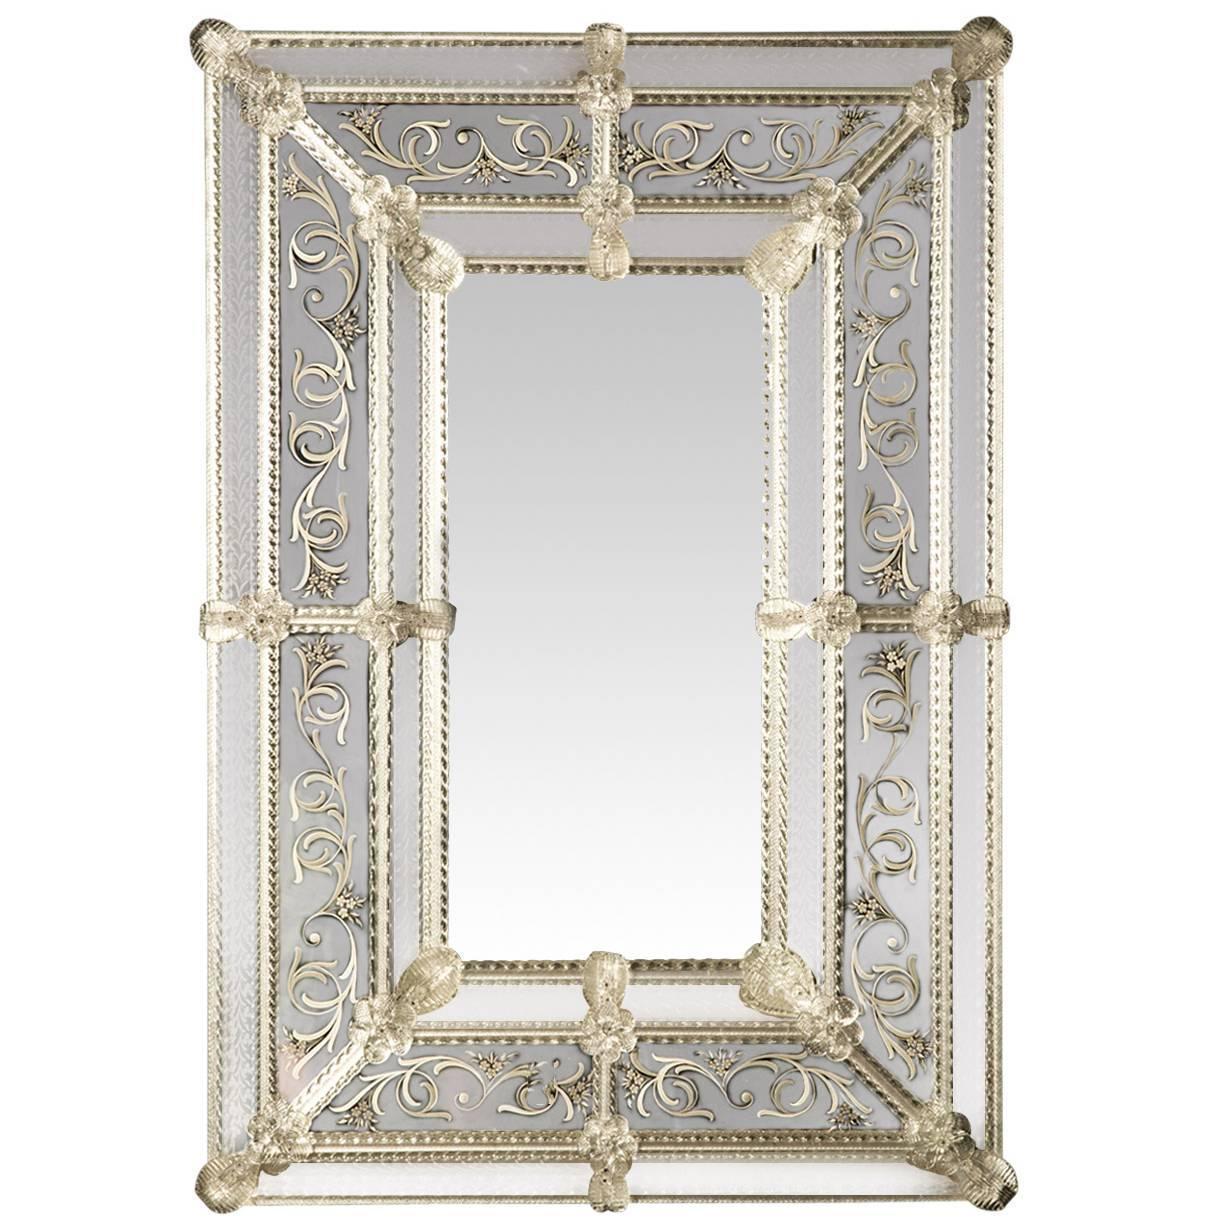 Inciso Venetian Murano Glass Mirror By Ongaro E Fuga For